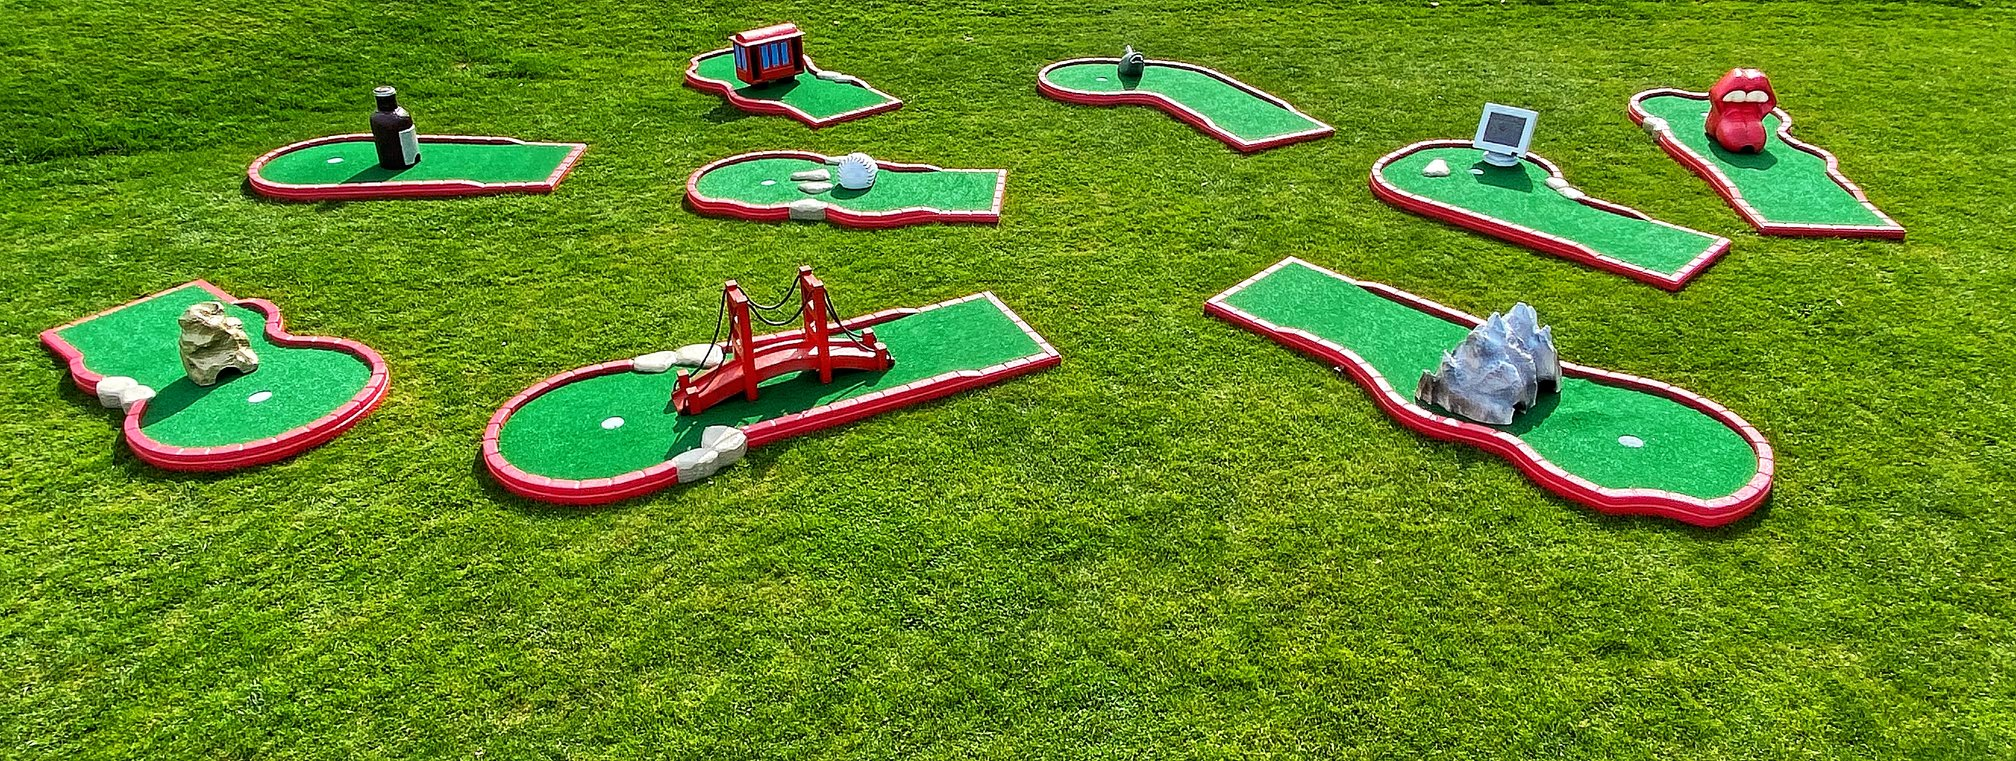 Miniature Golf Course Rental San Francisco